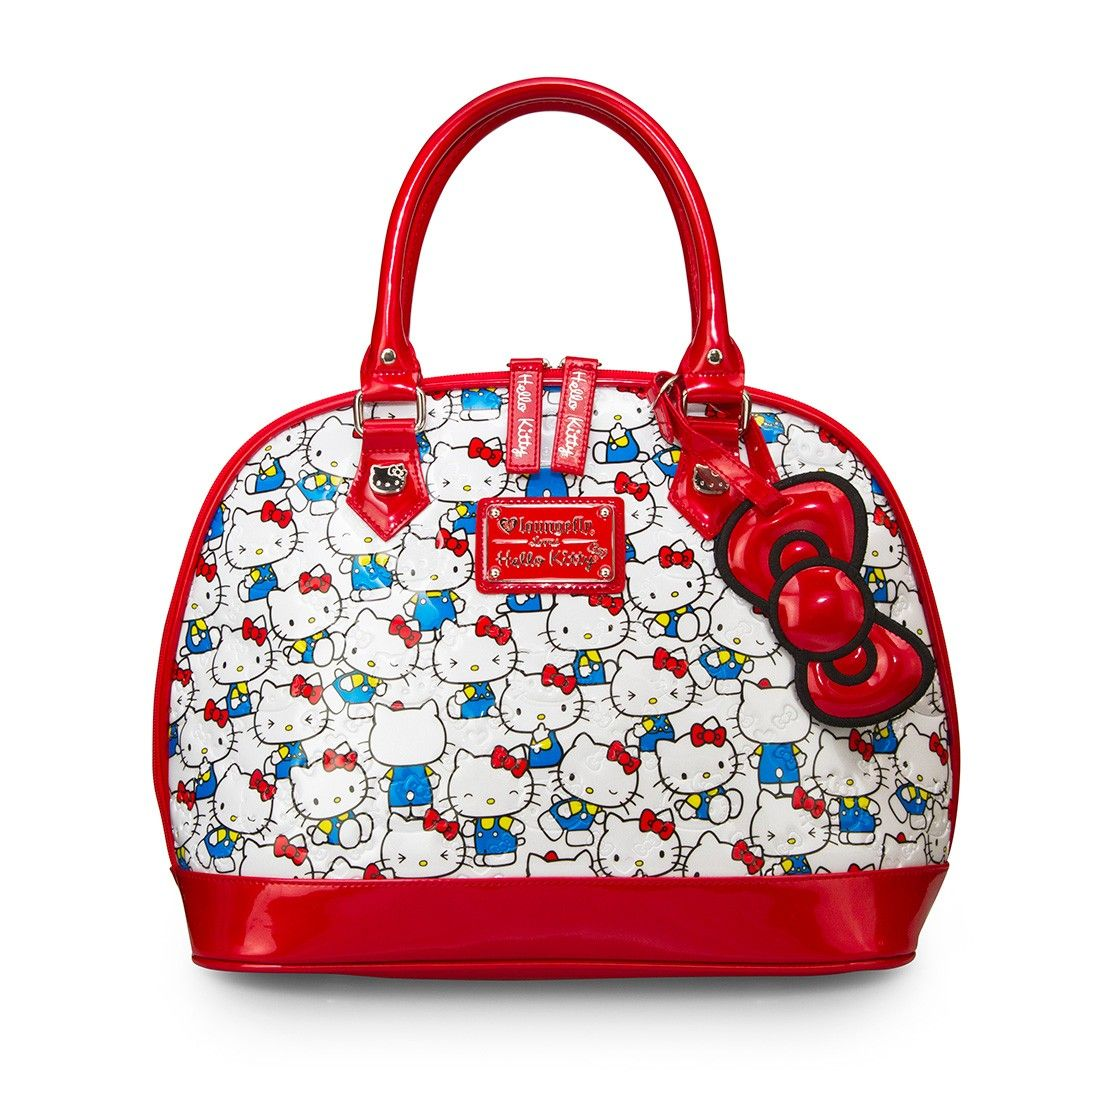 9617379de Hello Kitty Vintage Print Patent Embossed Bag - Hello Kitty - Brands ...